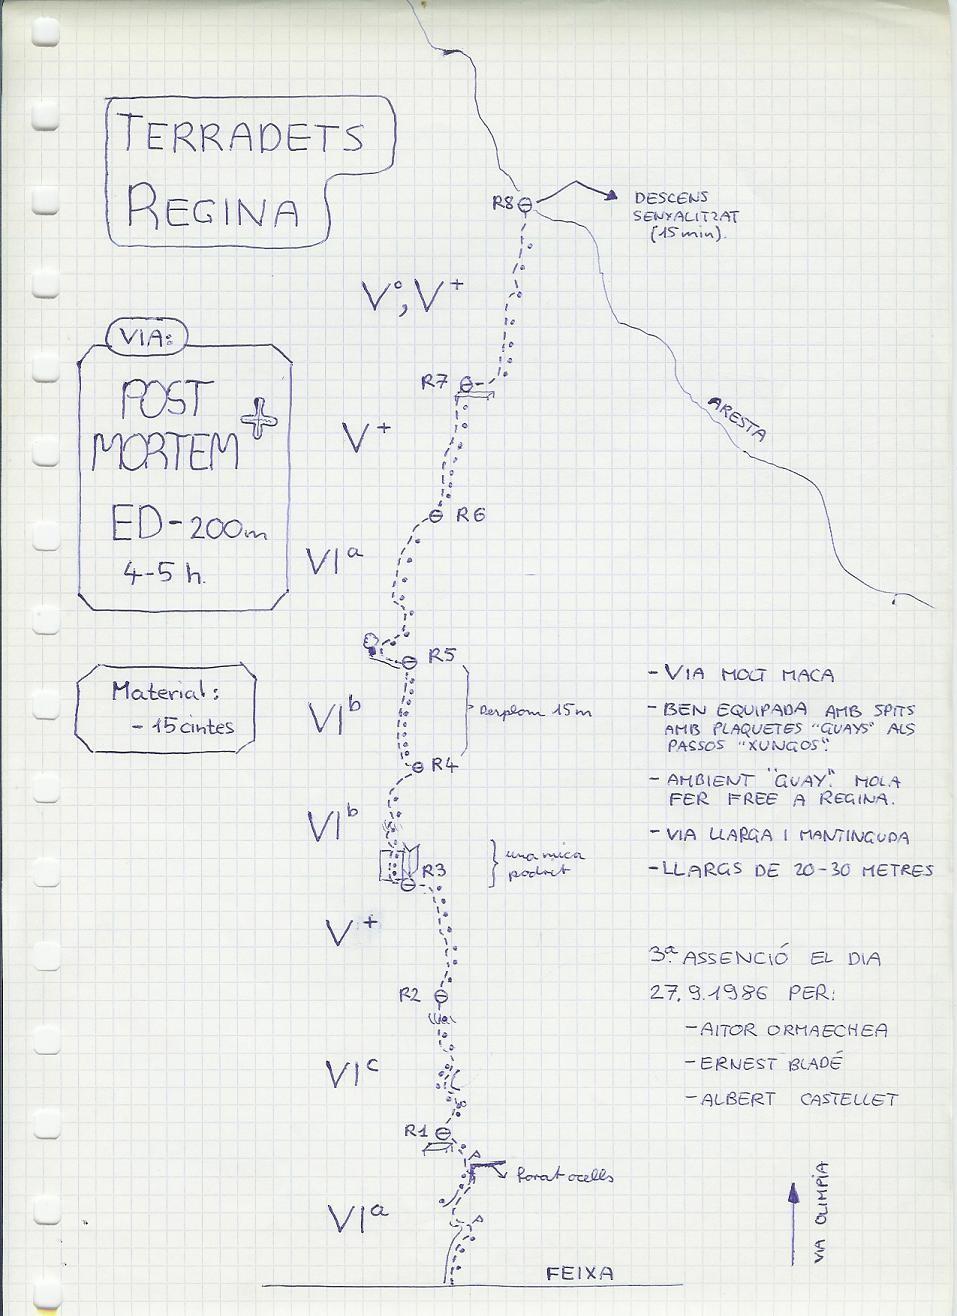 Topo Terradets - Roca Regina, Post Mortem